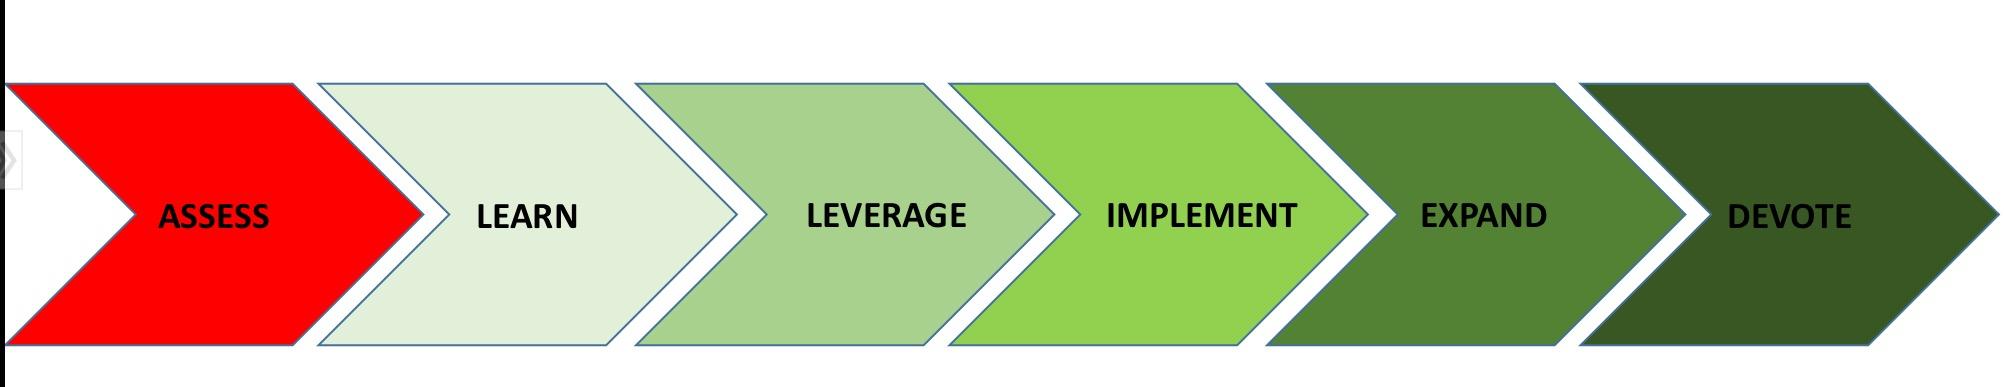 Medición de valor de servicios de asesoría en Lean Six Sigma  9dsc7E